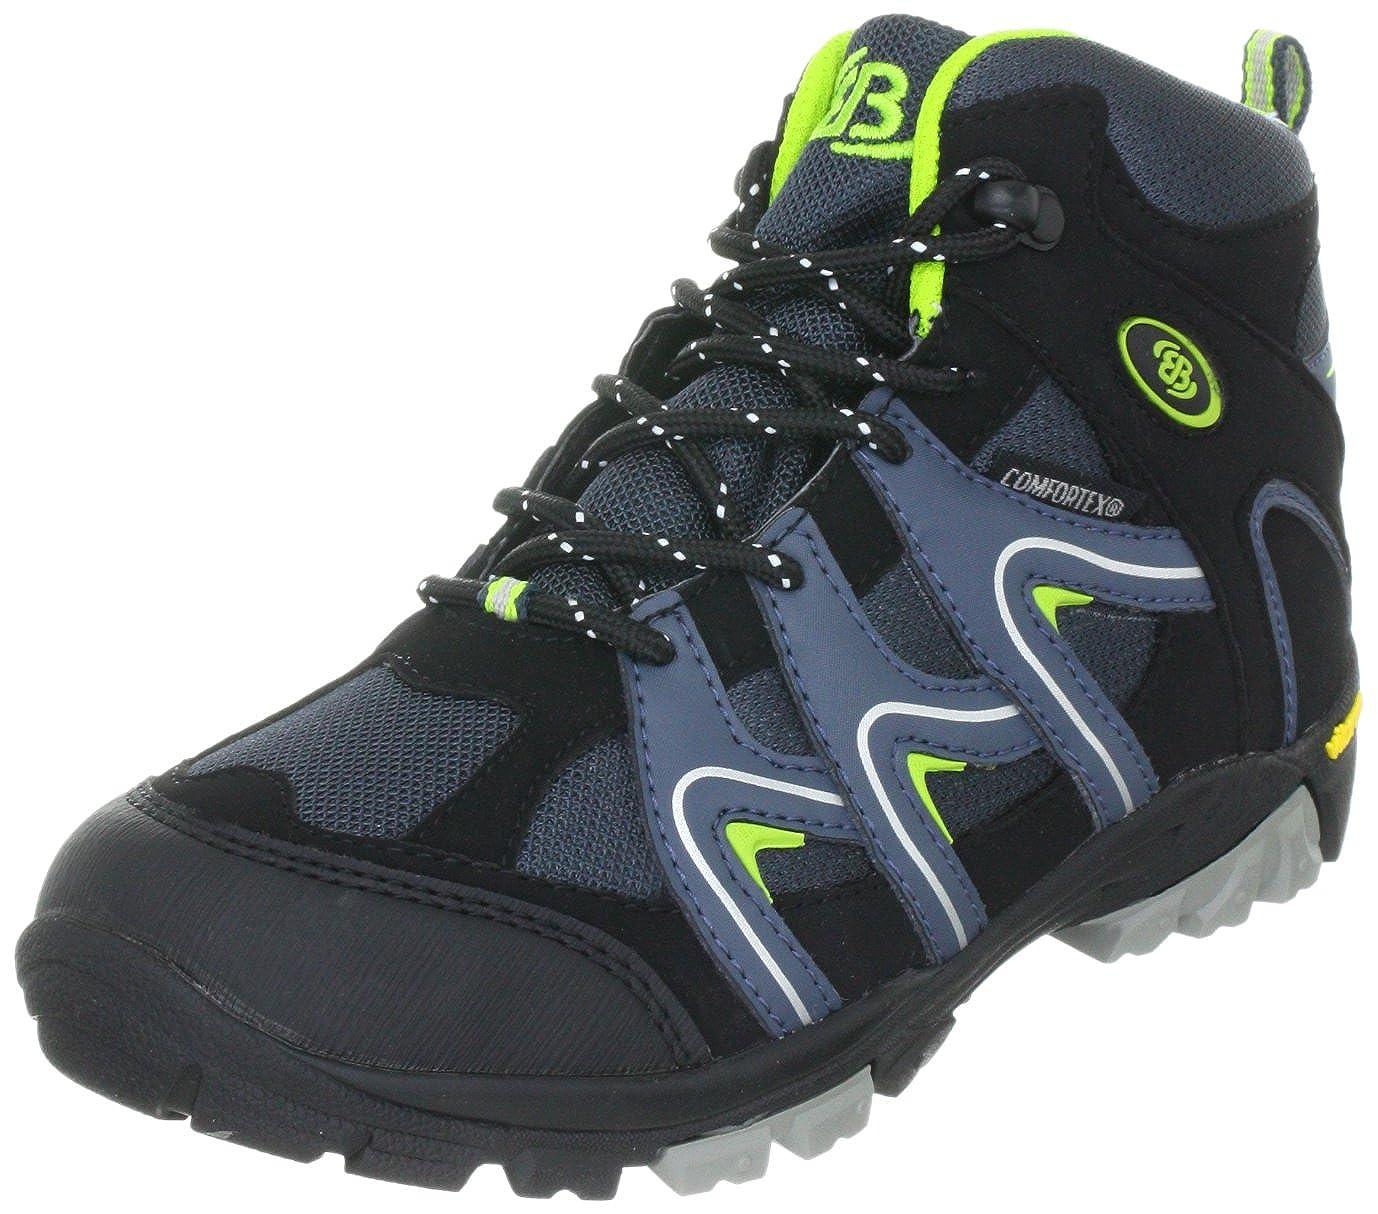 Bleu (Petrol noir Lemon) 36 EU Bruetting Vision high Enfants Vision High Enfants, Chaussures de randonnée garçon